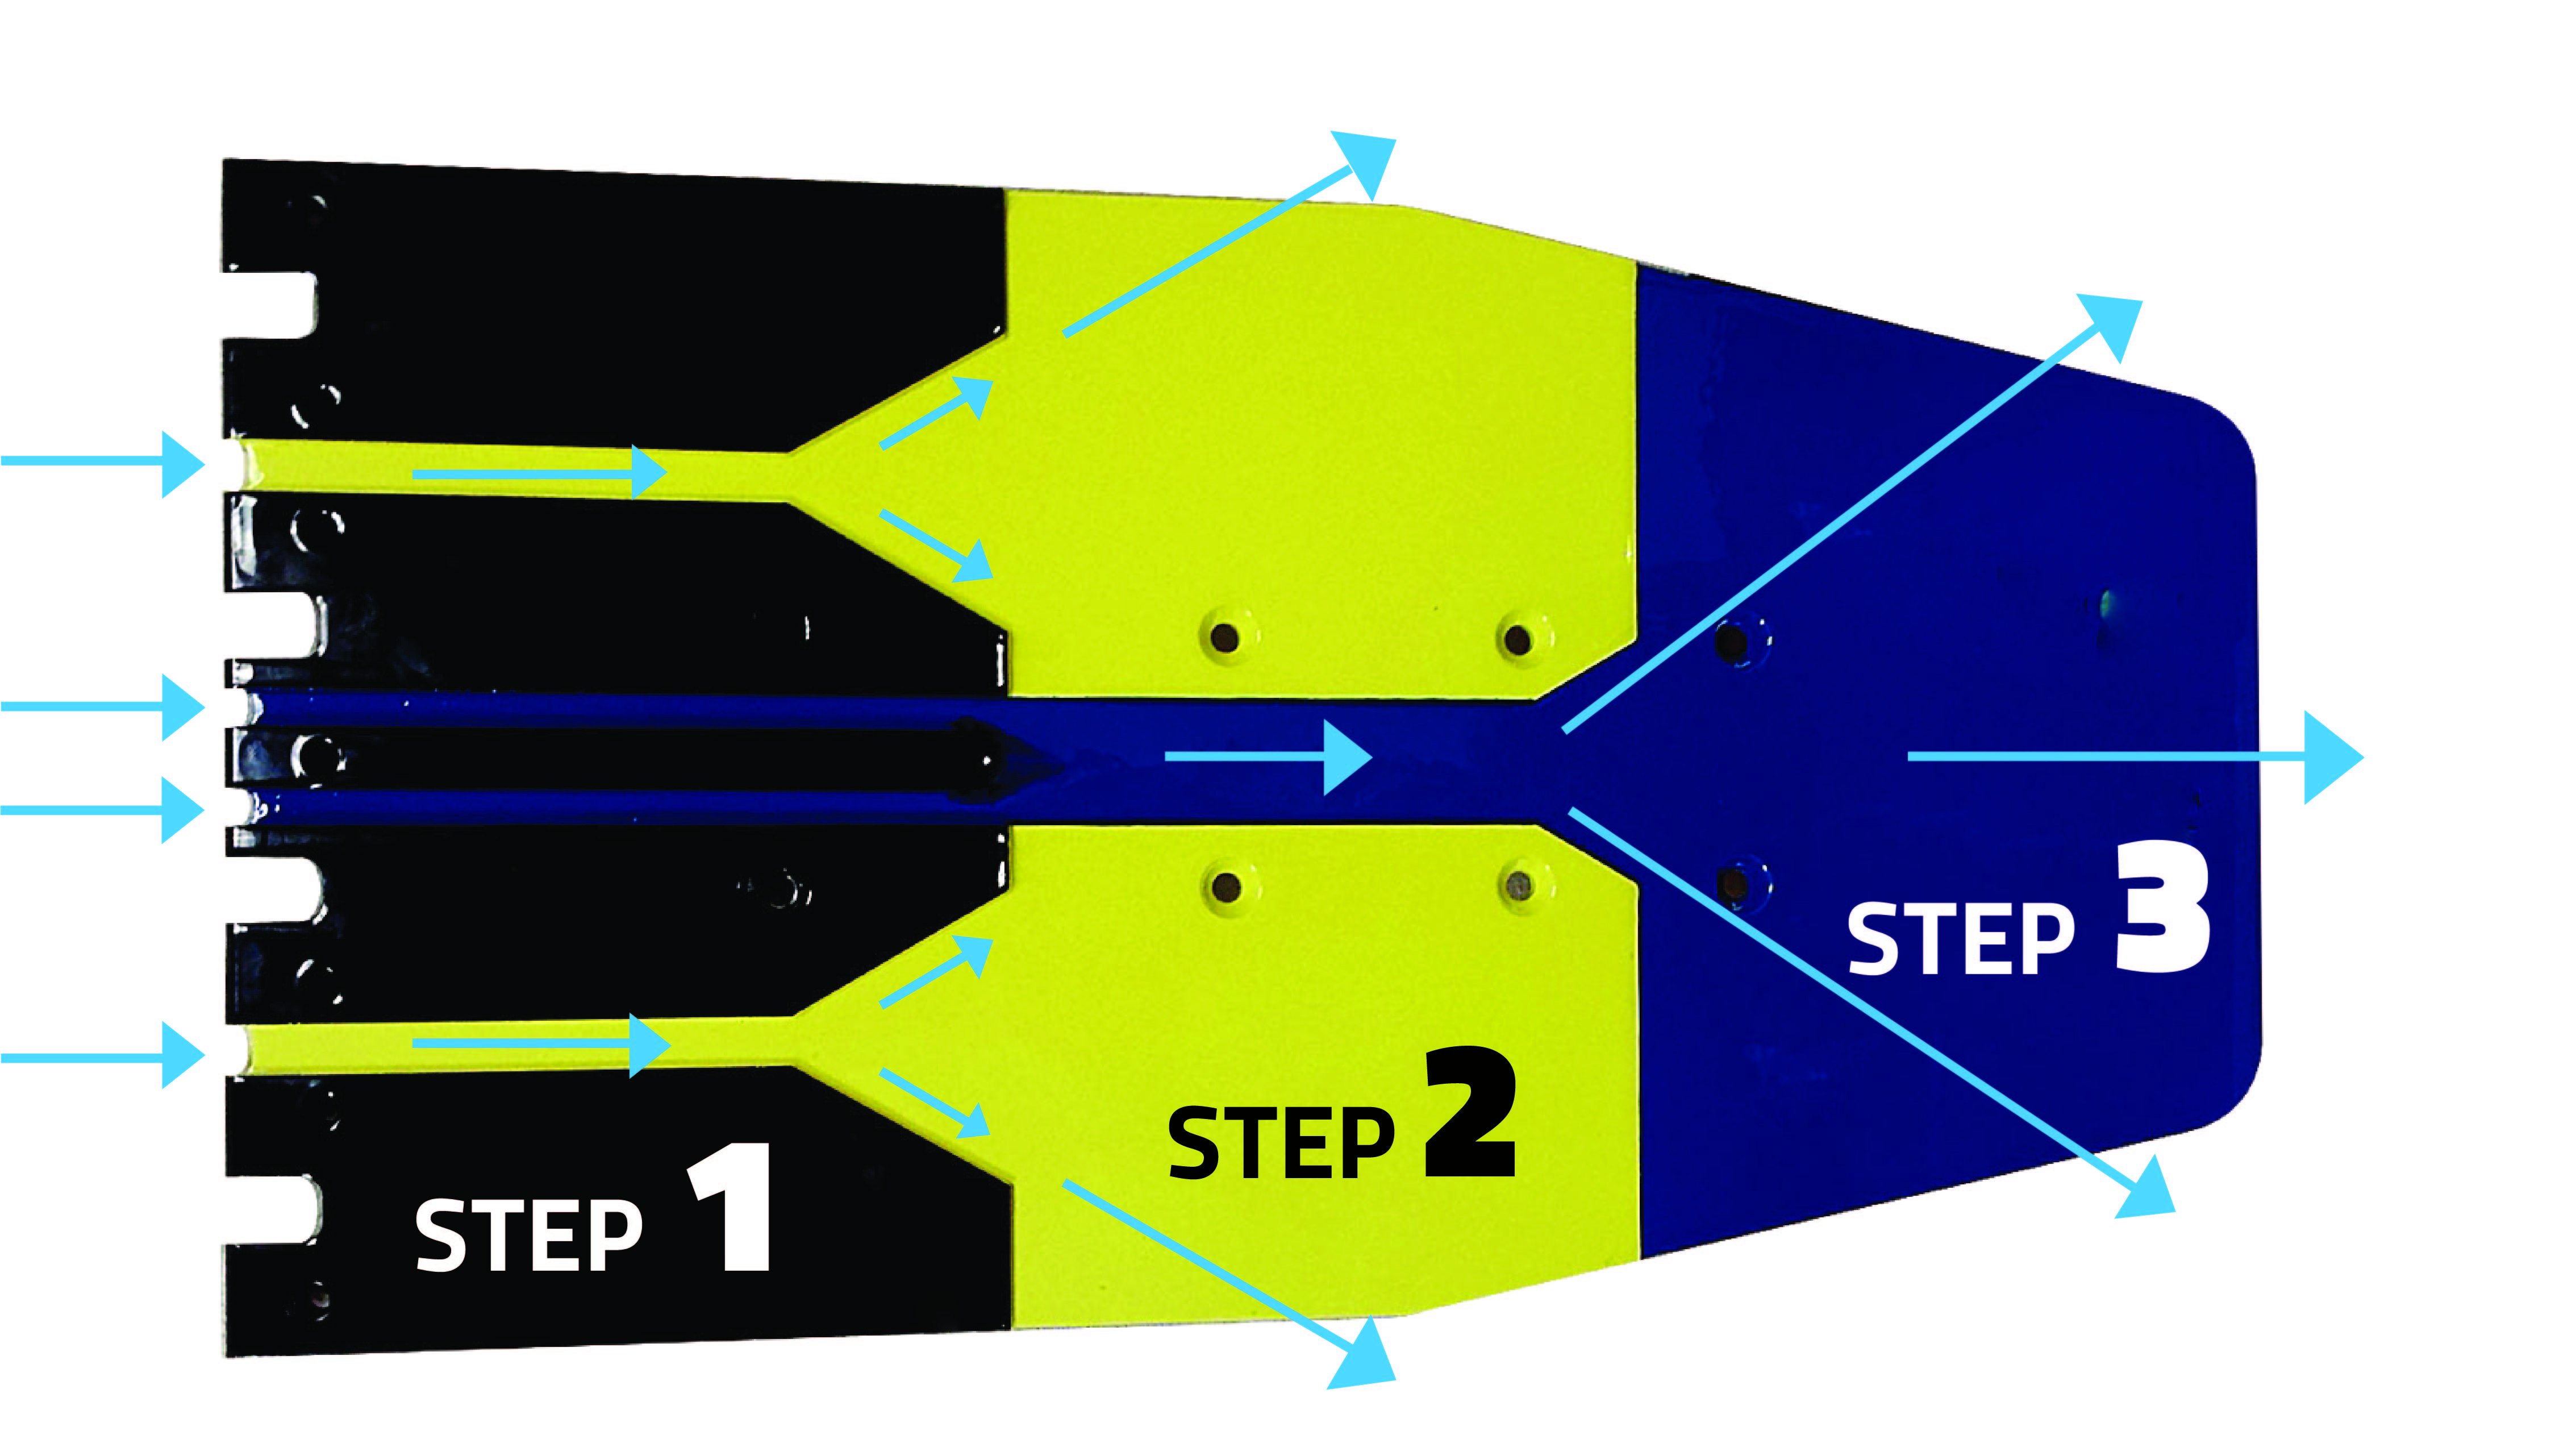 Garmin Gpsmap Circuit Diagram 162 Wiring 430 Livorsi Gps Block And Schematic Diagrams U2022 750s